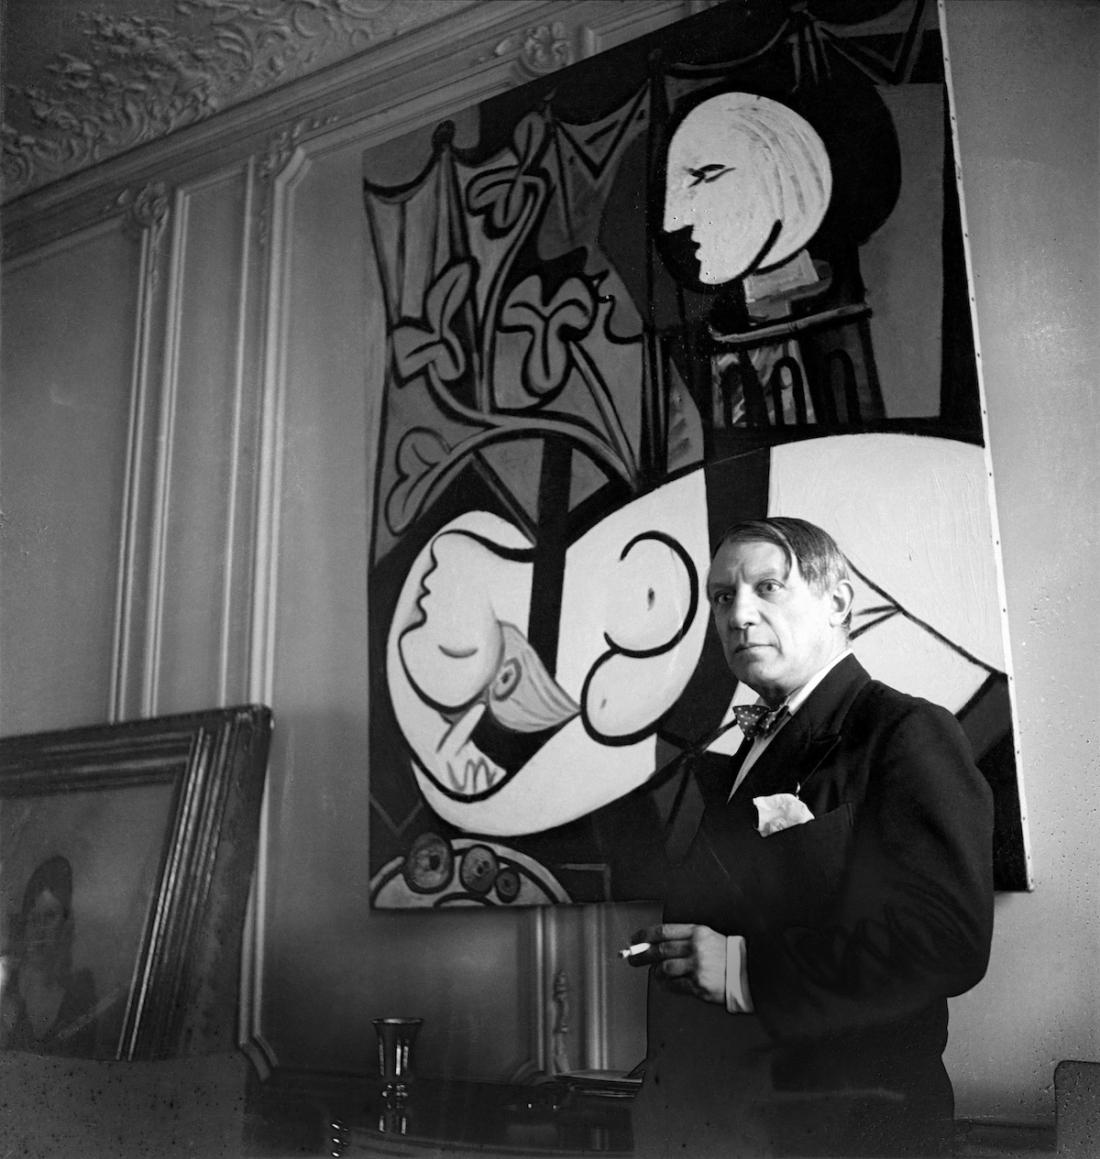 Cecil Beaton Pablo Picasso, rue La Boétie, 1933, Paris (c) The Cecil Beaton Studio Archive at Sotheby's